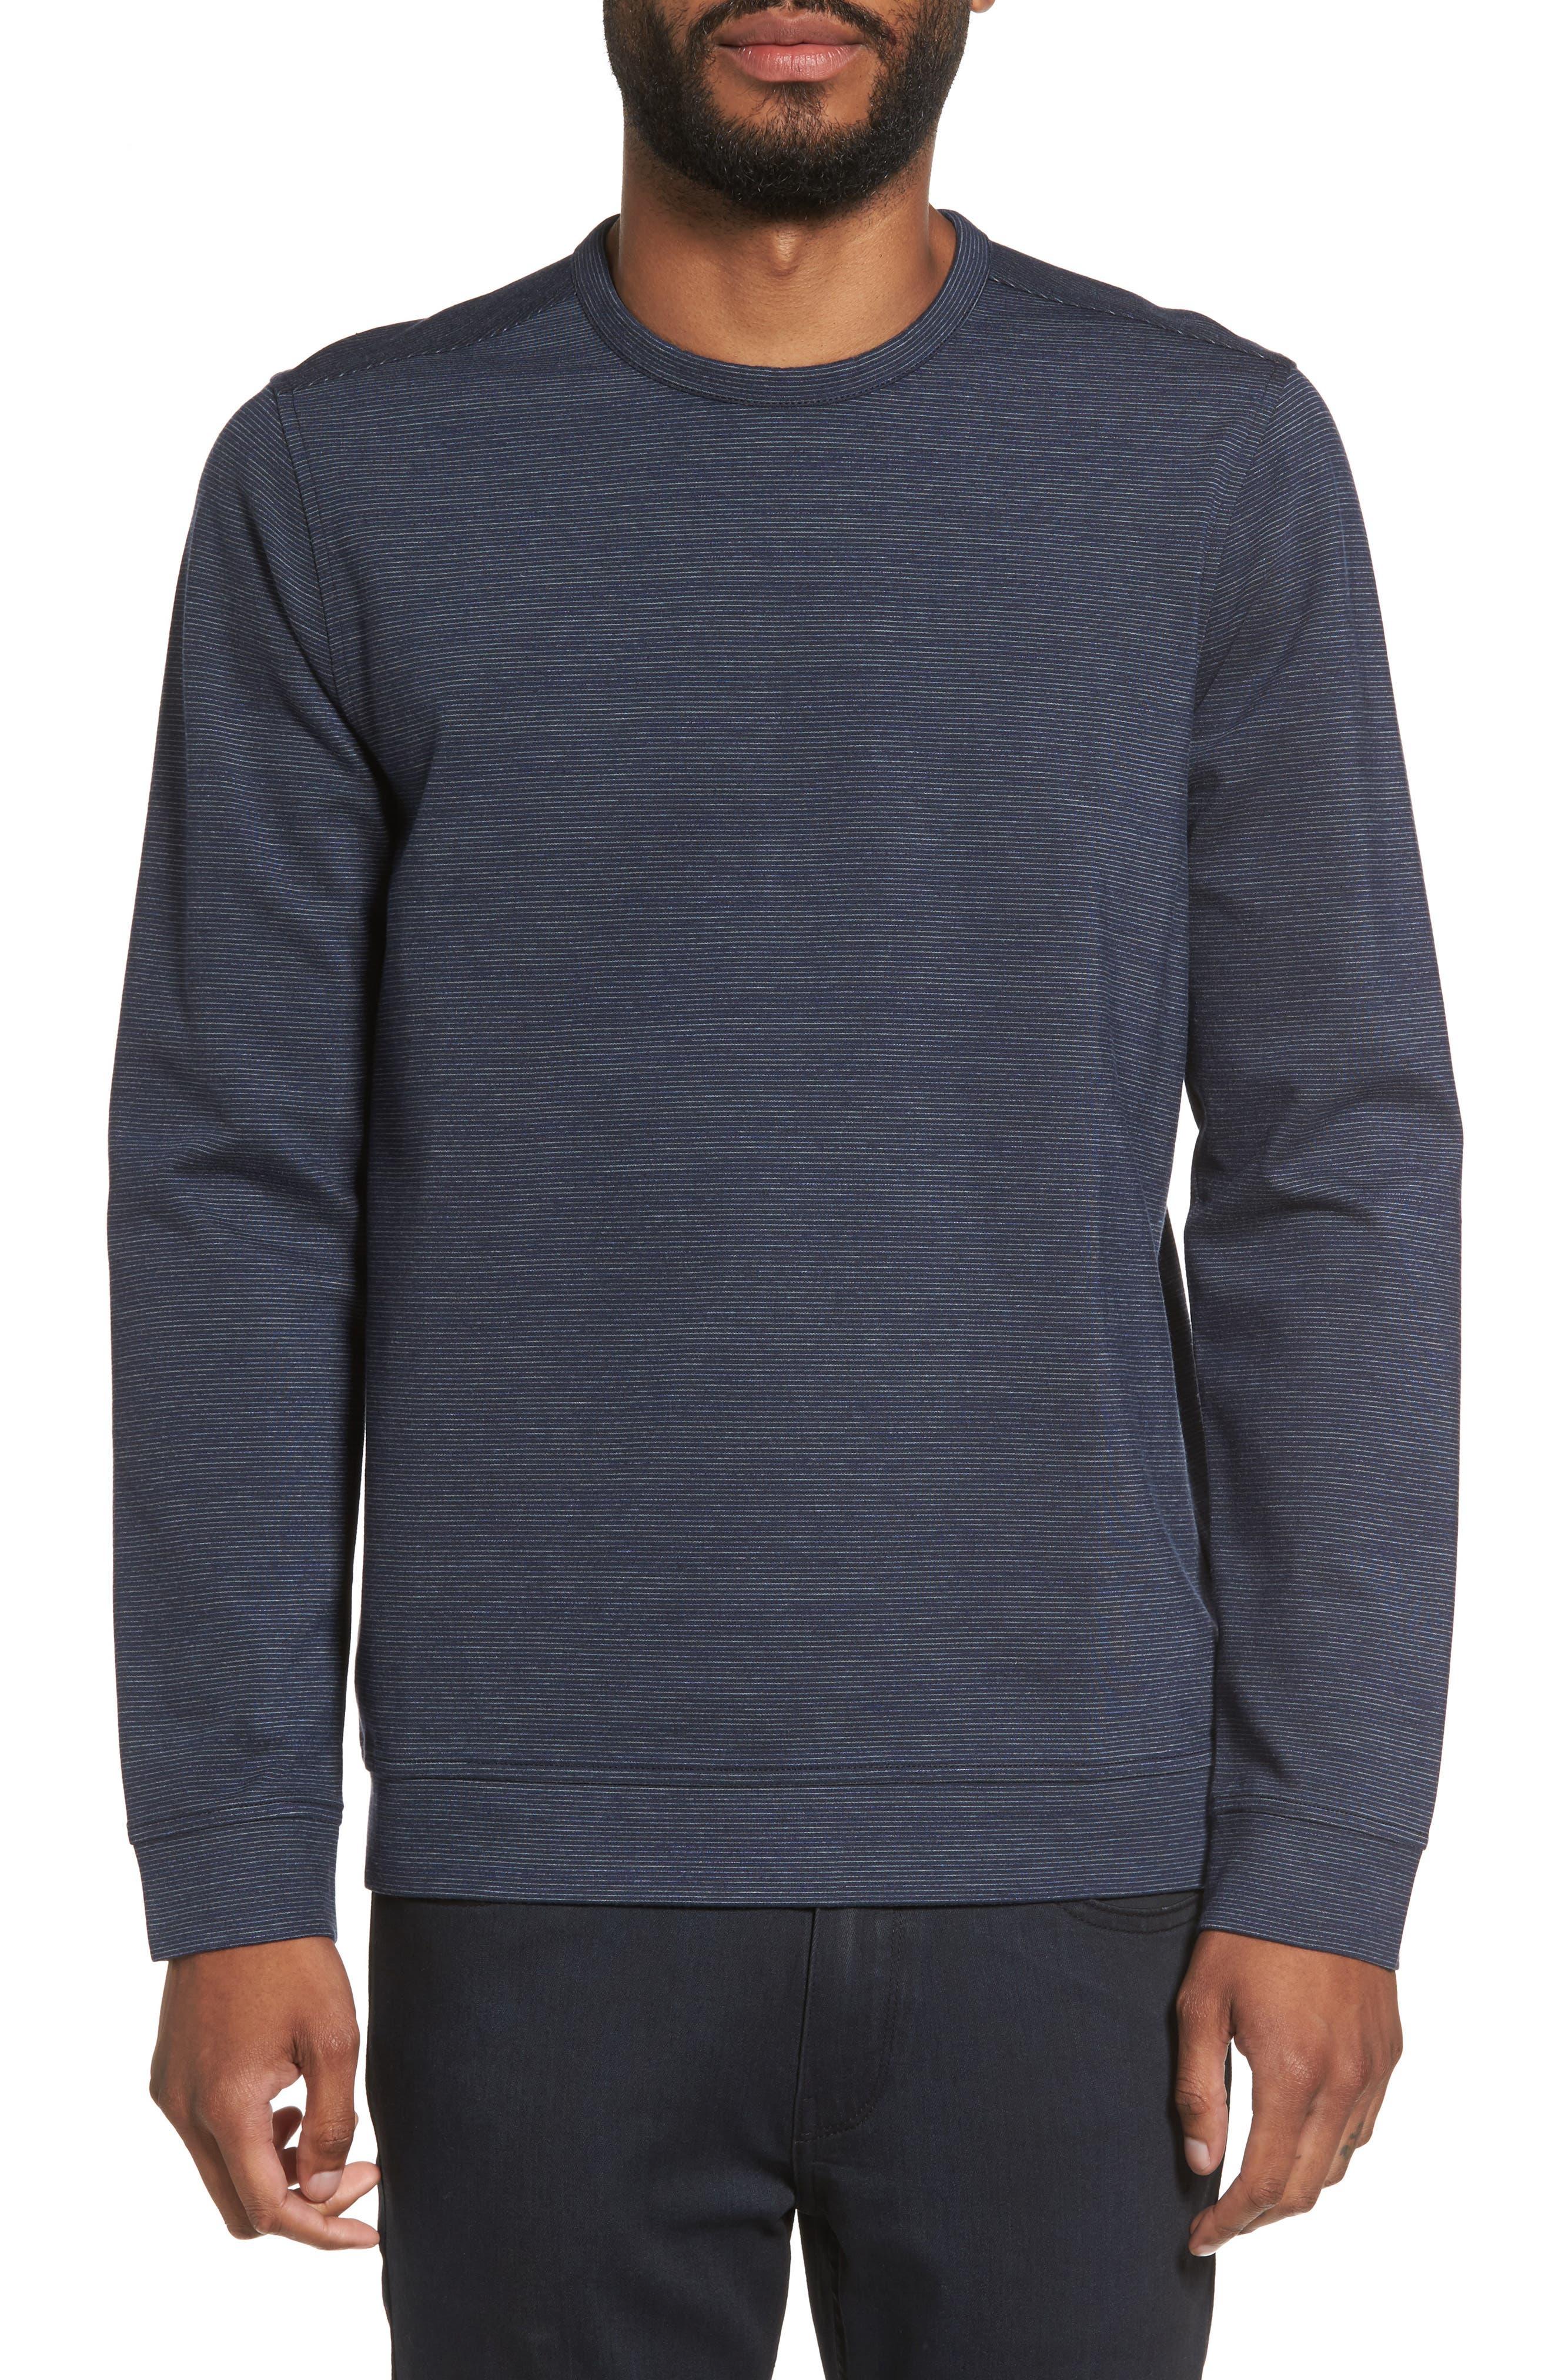 Space Dye Stripe Sweatshirt,                             Main thumbnail 1, color,                             Navy Night Spacedye